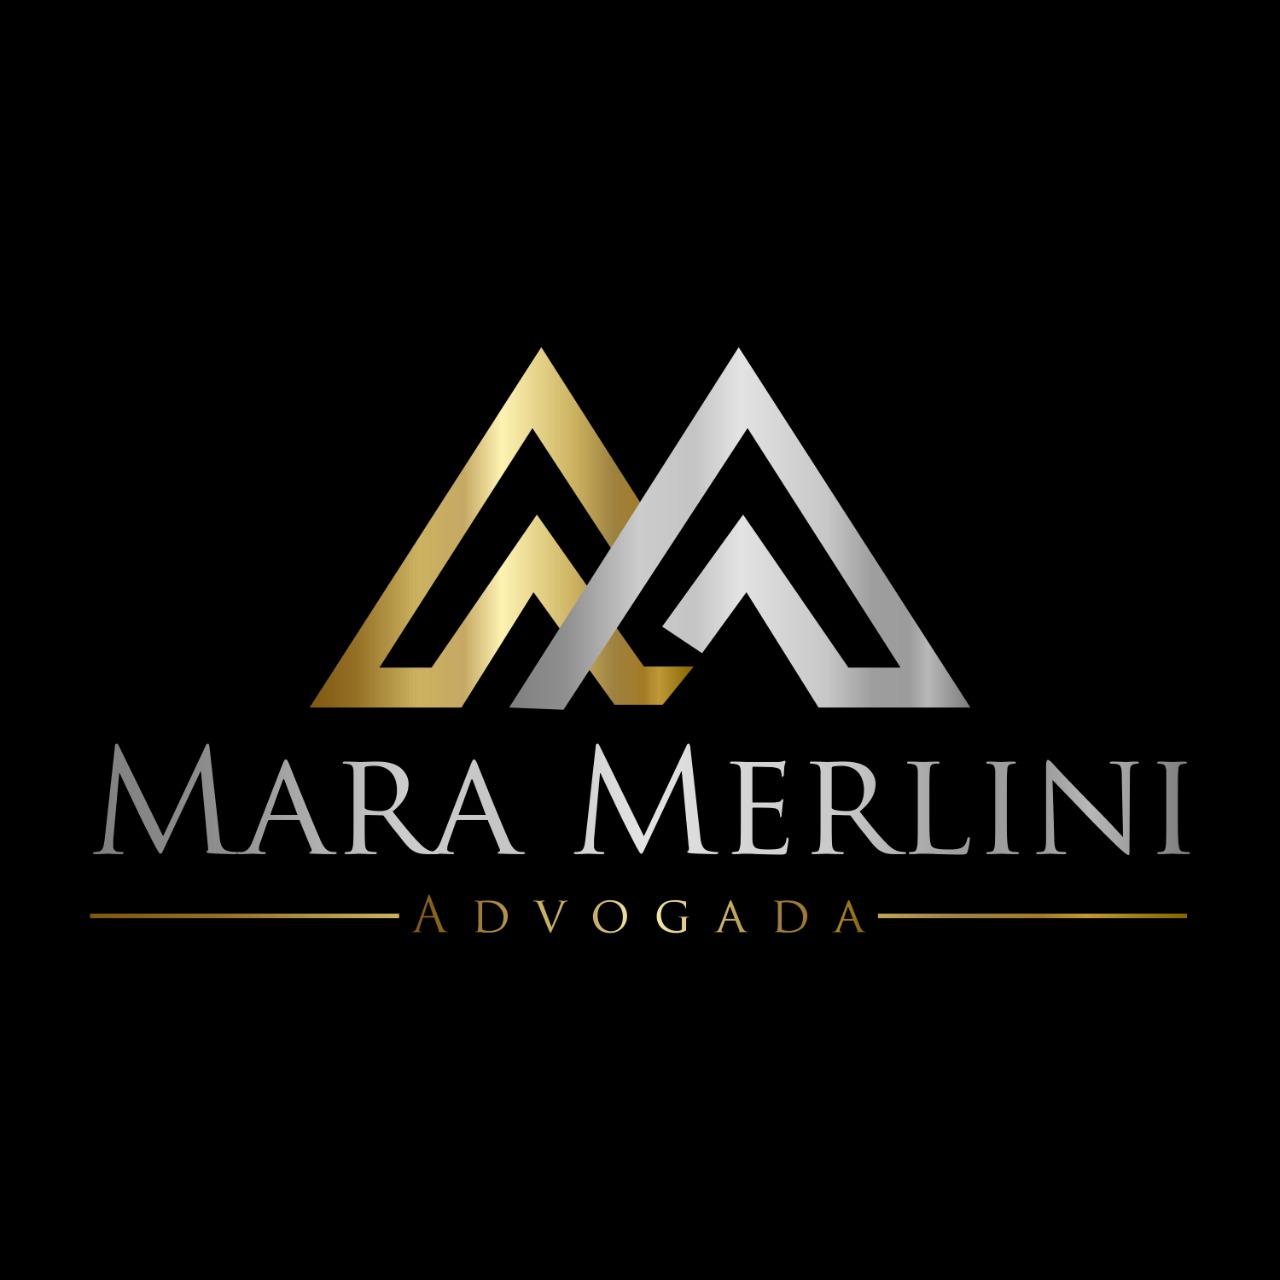 Mara Merlini Advogada